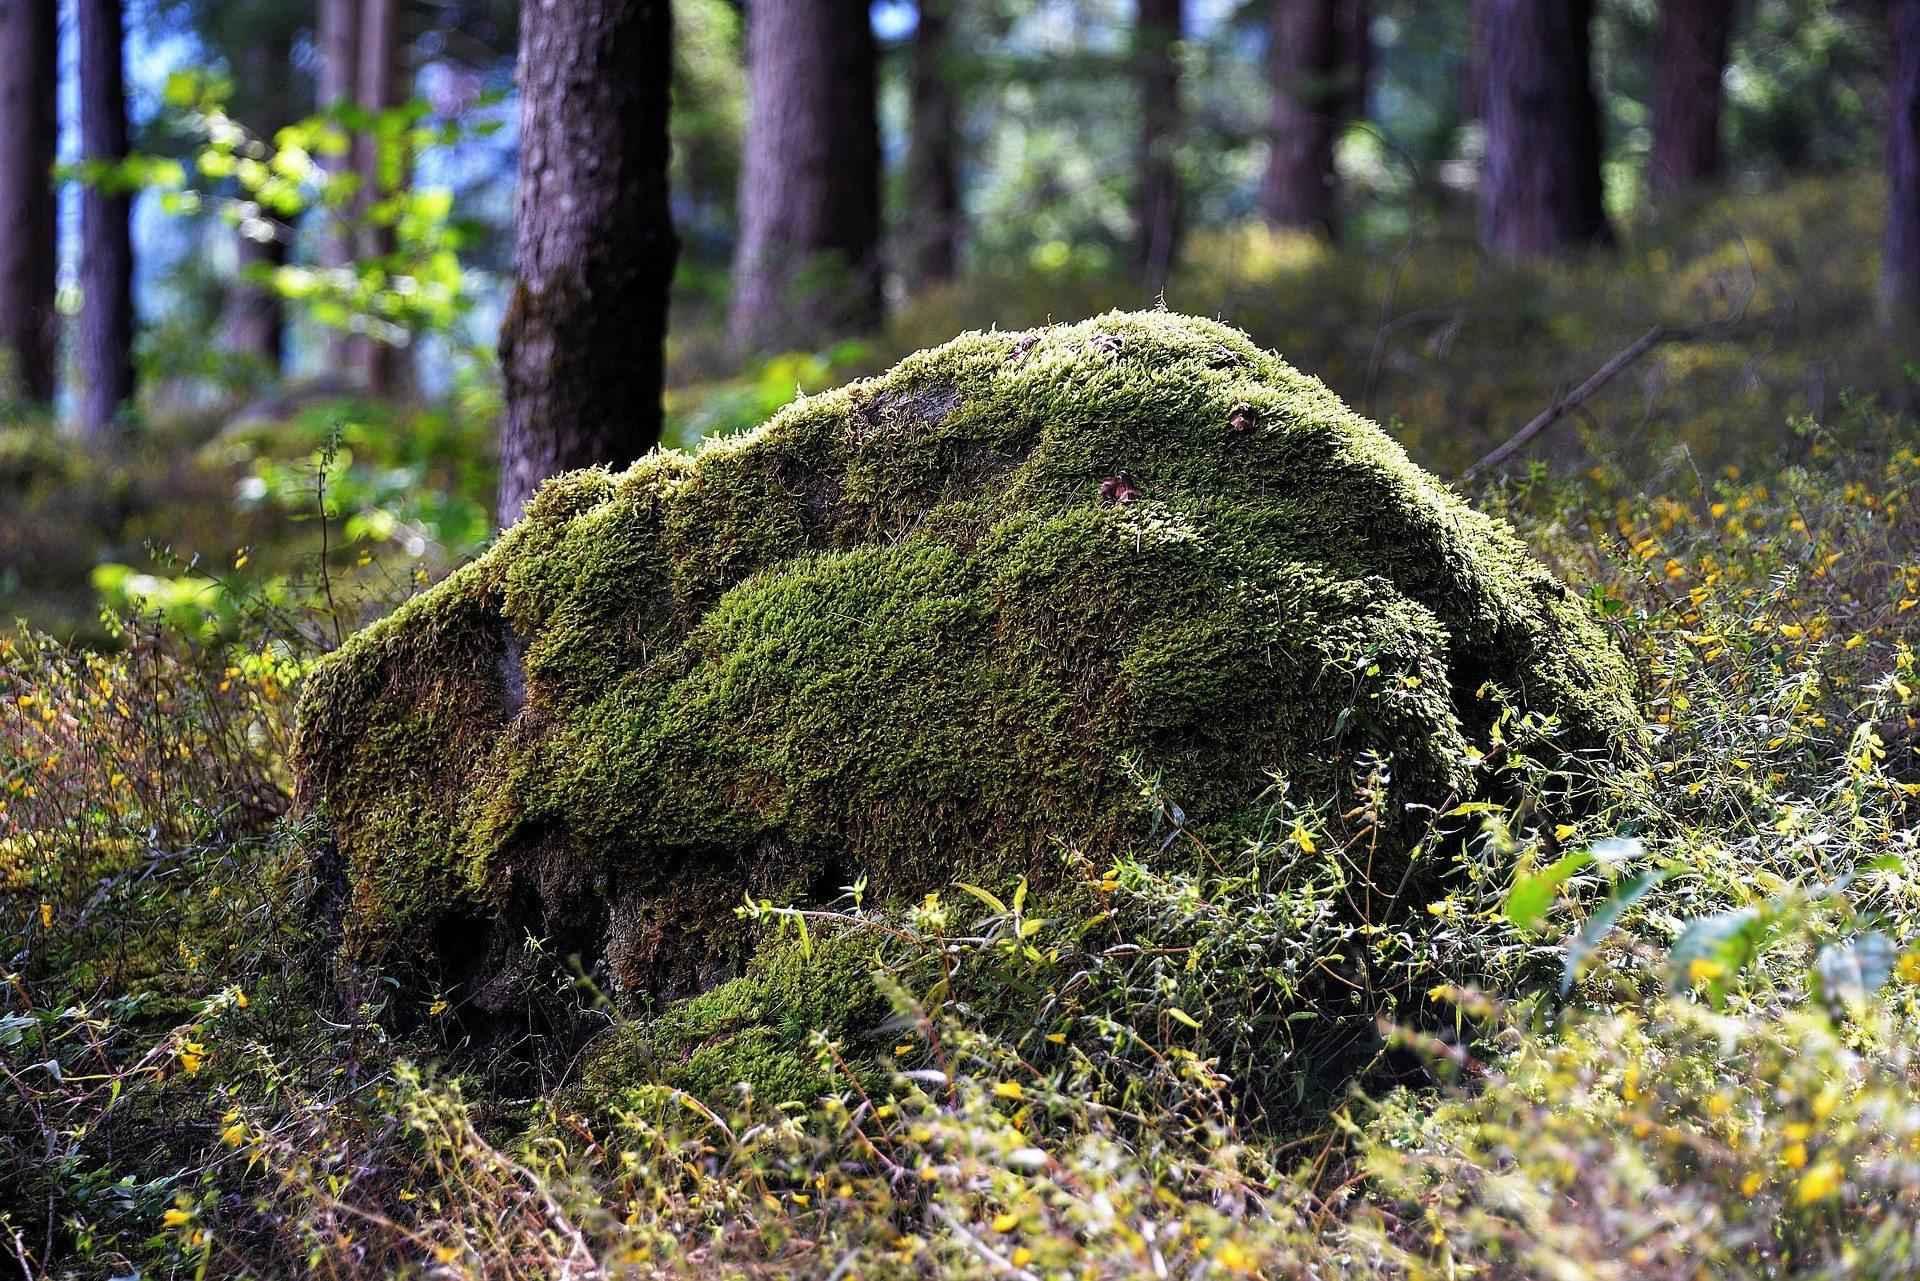 moh-na-kamne-v-lesu